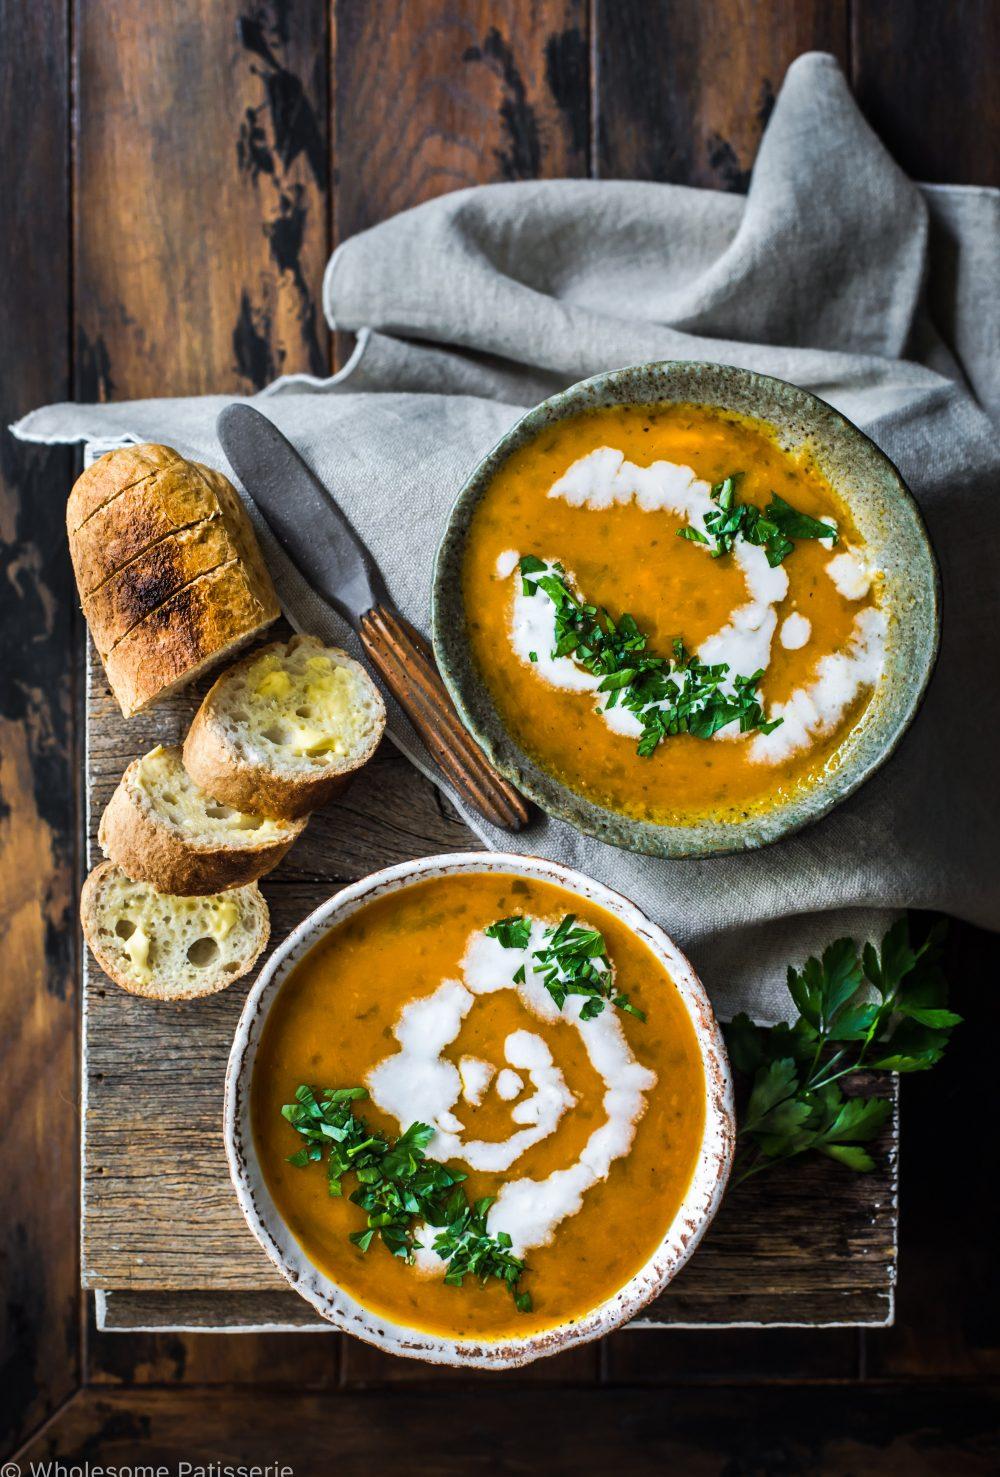 pumpkin-soup-vegan-vegetarian-gluten-free-dinner-entree-winter-easy-soup